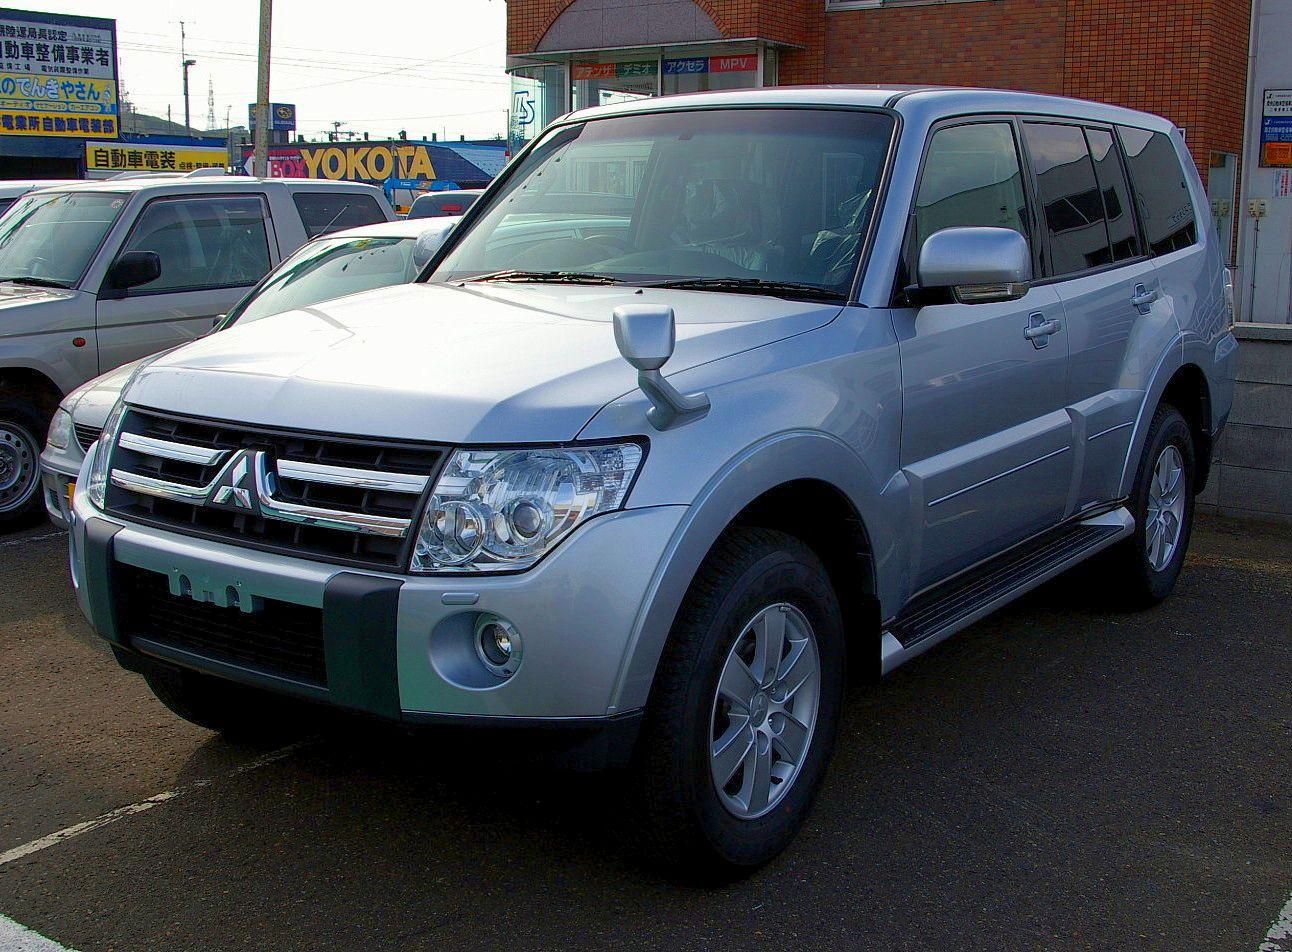 Mitsubishi Pajero Used Cars For Sale In Dubai